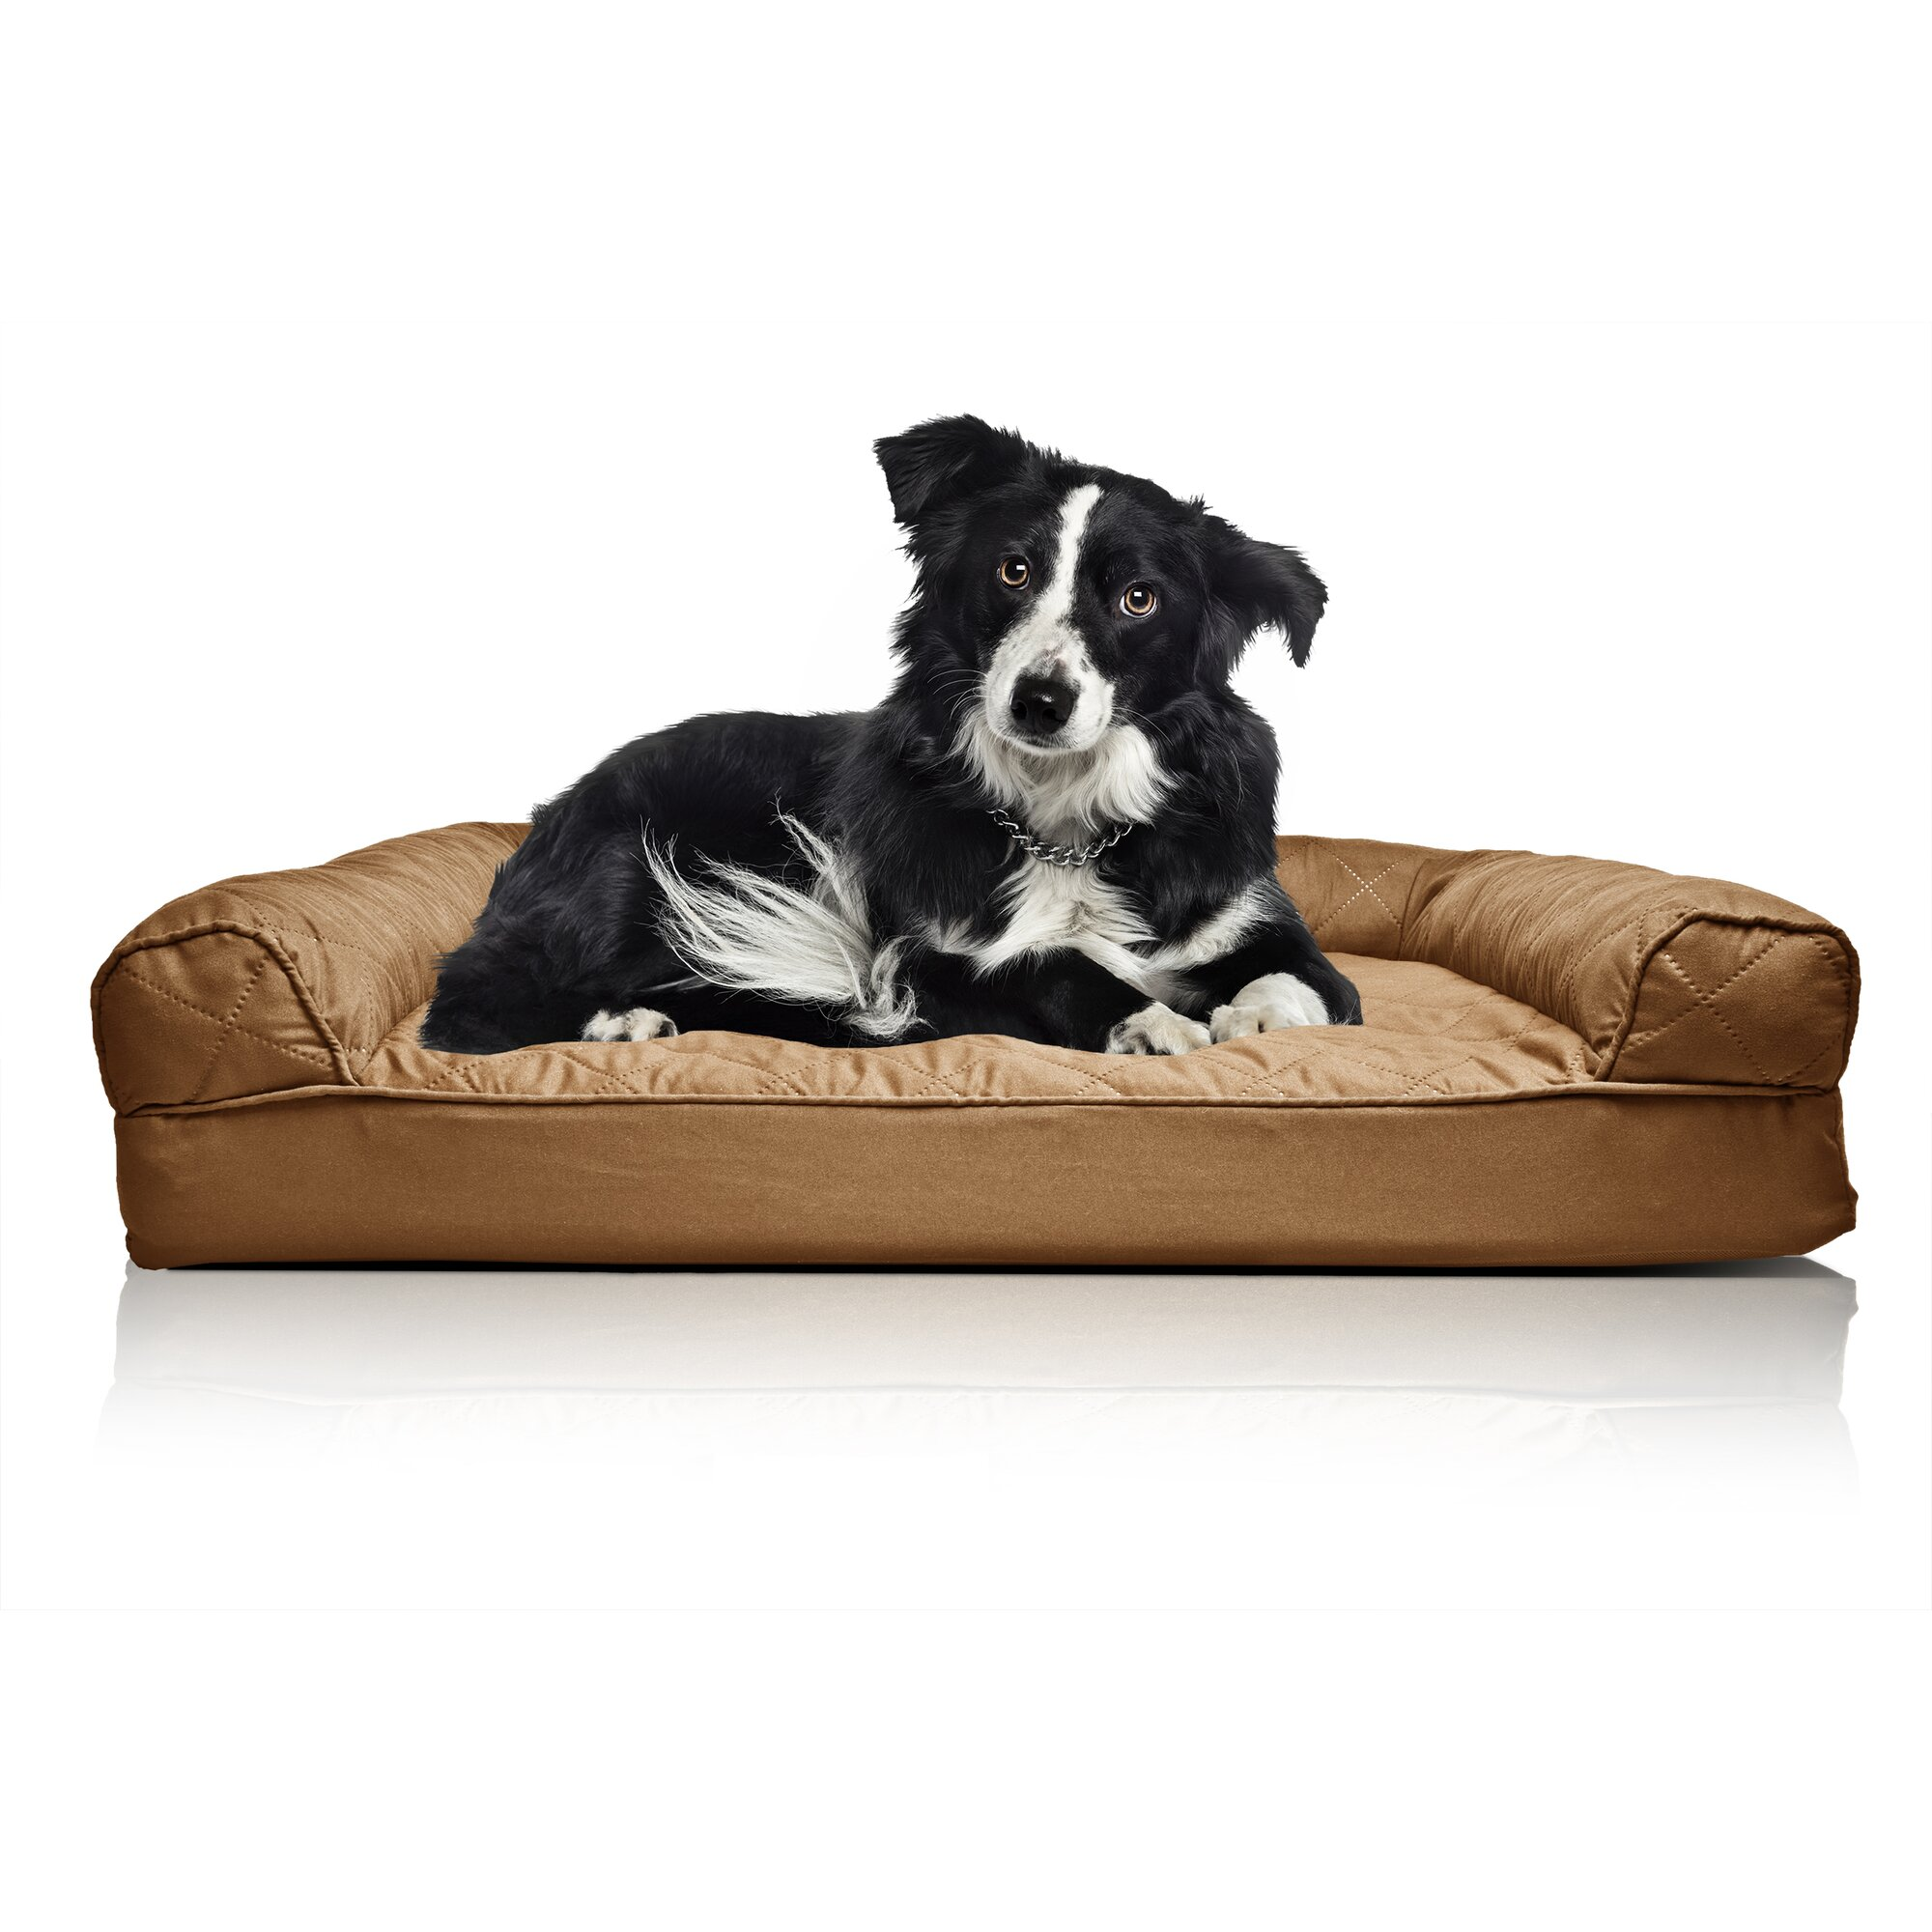 Orthopedic Sofa Dog Bed Hereo Sofa